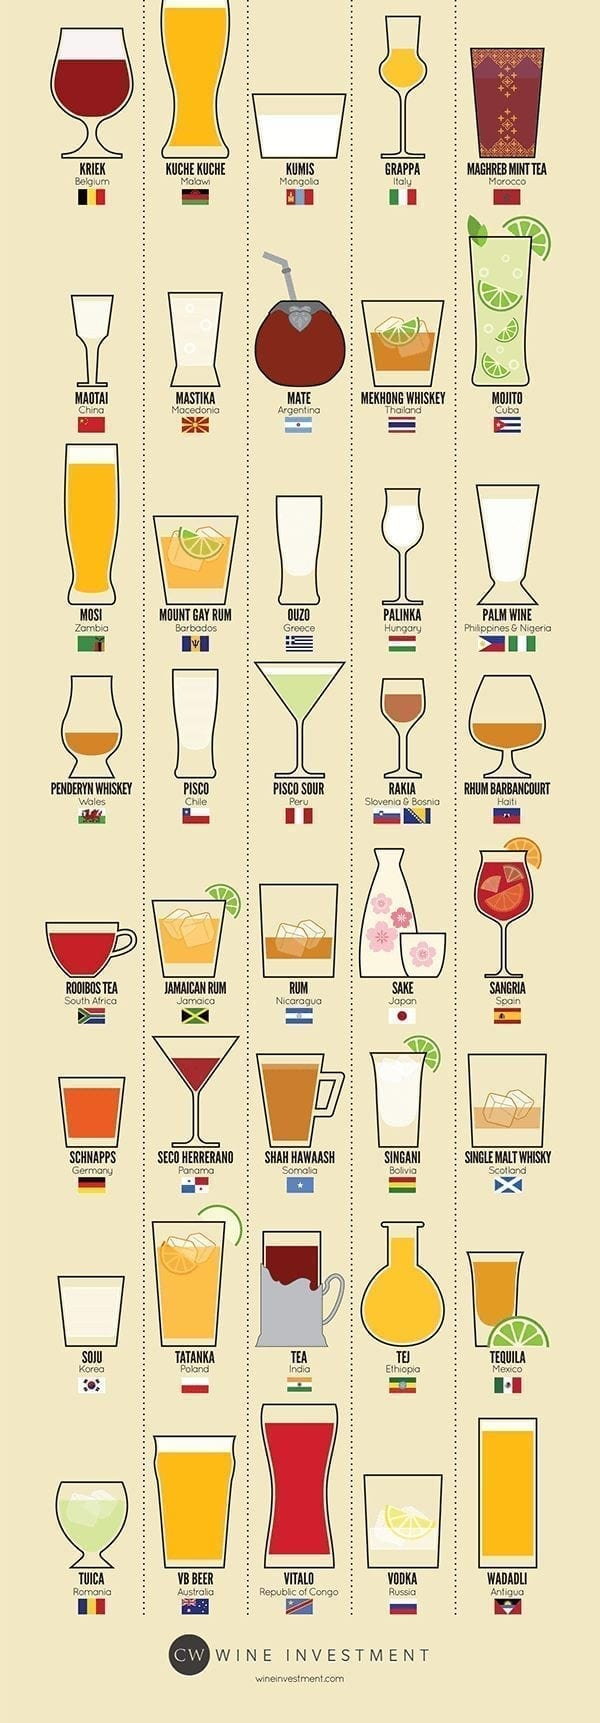 inlingua Edinburgh - infographic - around the word with drinks 2